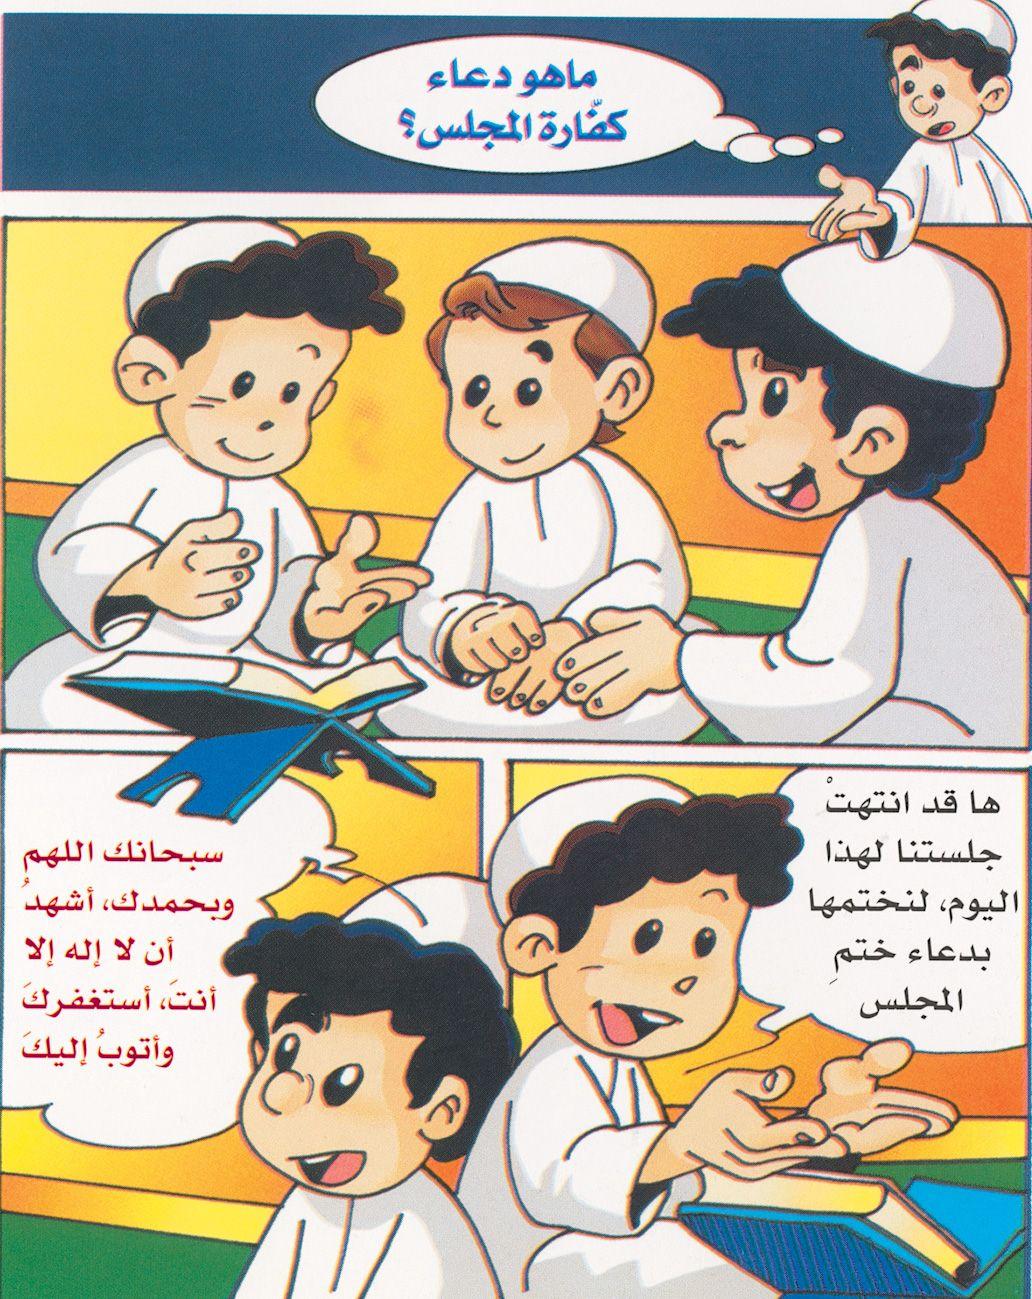 Pin By بسم الله الرحمن الرحيم On عربي Islamic Kids Activities Islam For Kids Baby Education